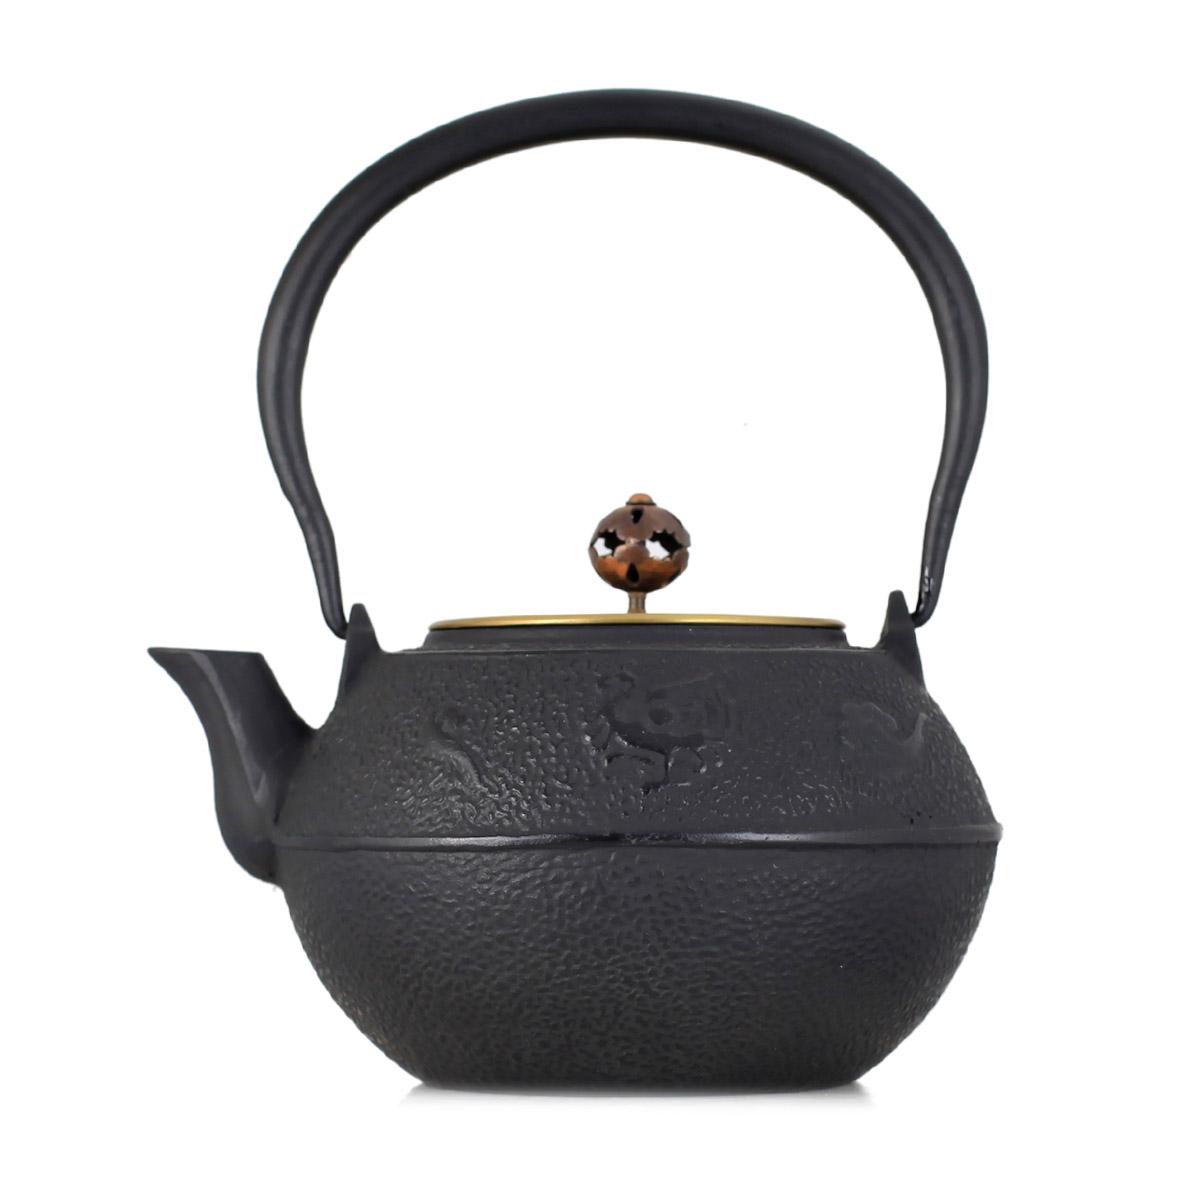 Japanese cast iron tea kettle promotion online shopping for promotional japanese cast iron tea - Cast iron dragon teapot ...